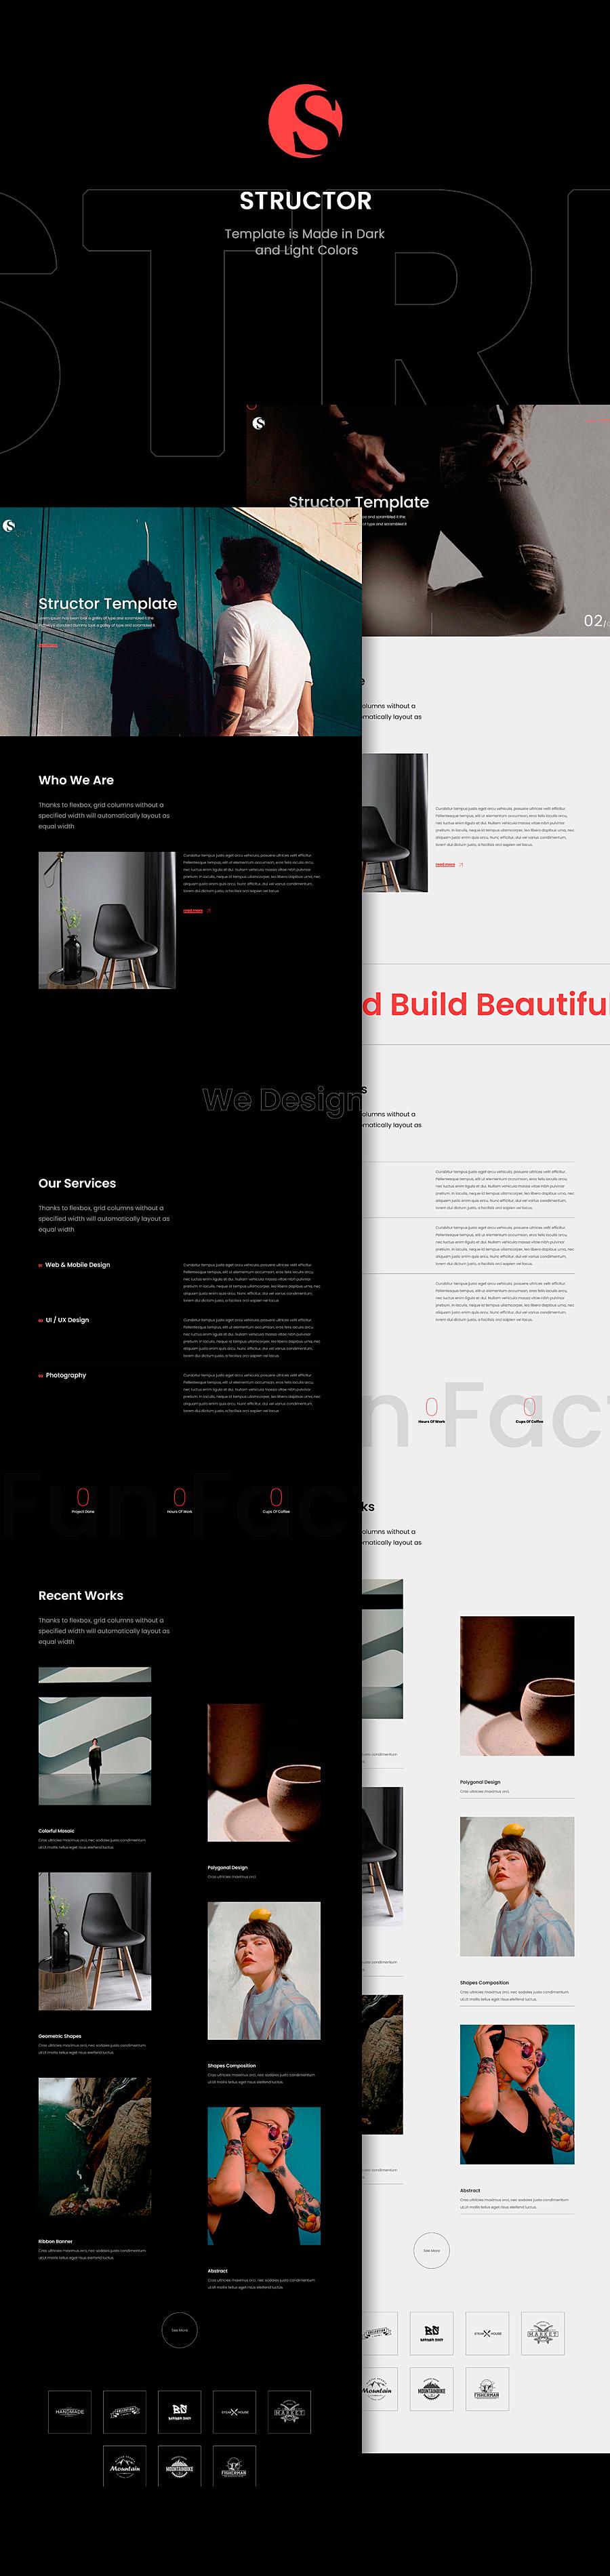 Structor - Creative Portfolio HTML Template - 1